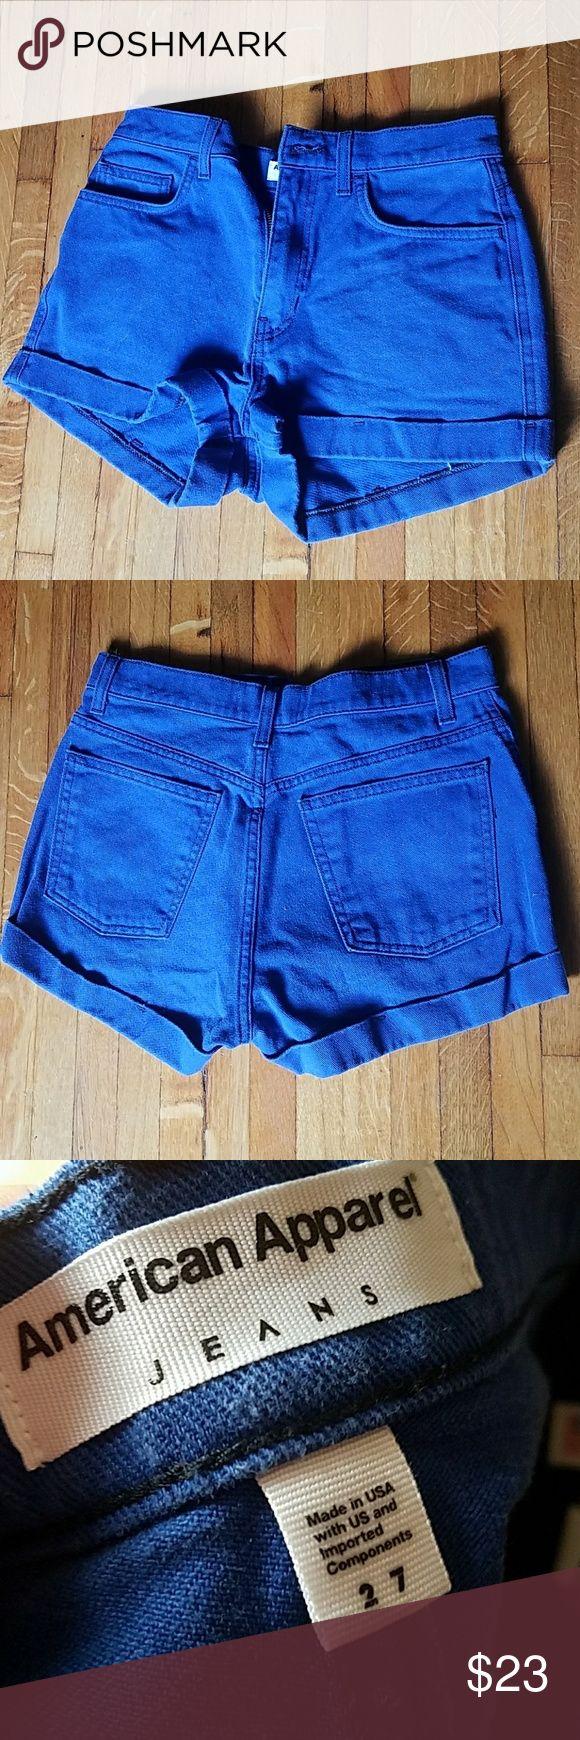 Blue American Apparel jean shorts Cobalt blue denim American Apparel shorts. Size 27. American Apparel Shorts Jean Shorts